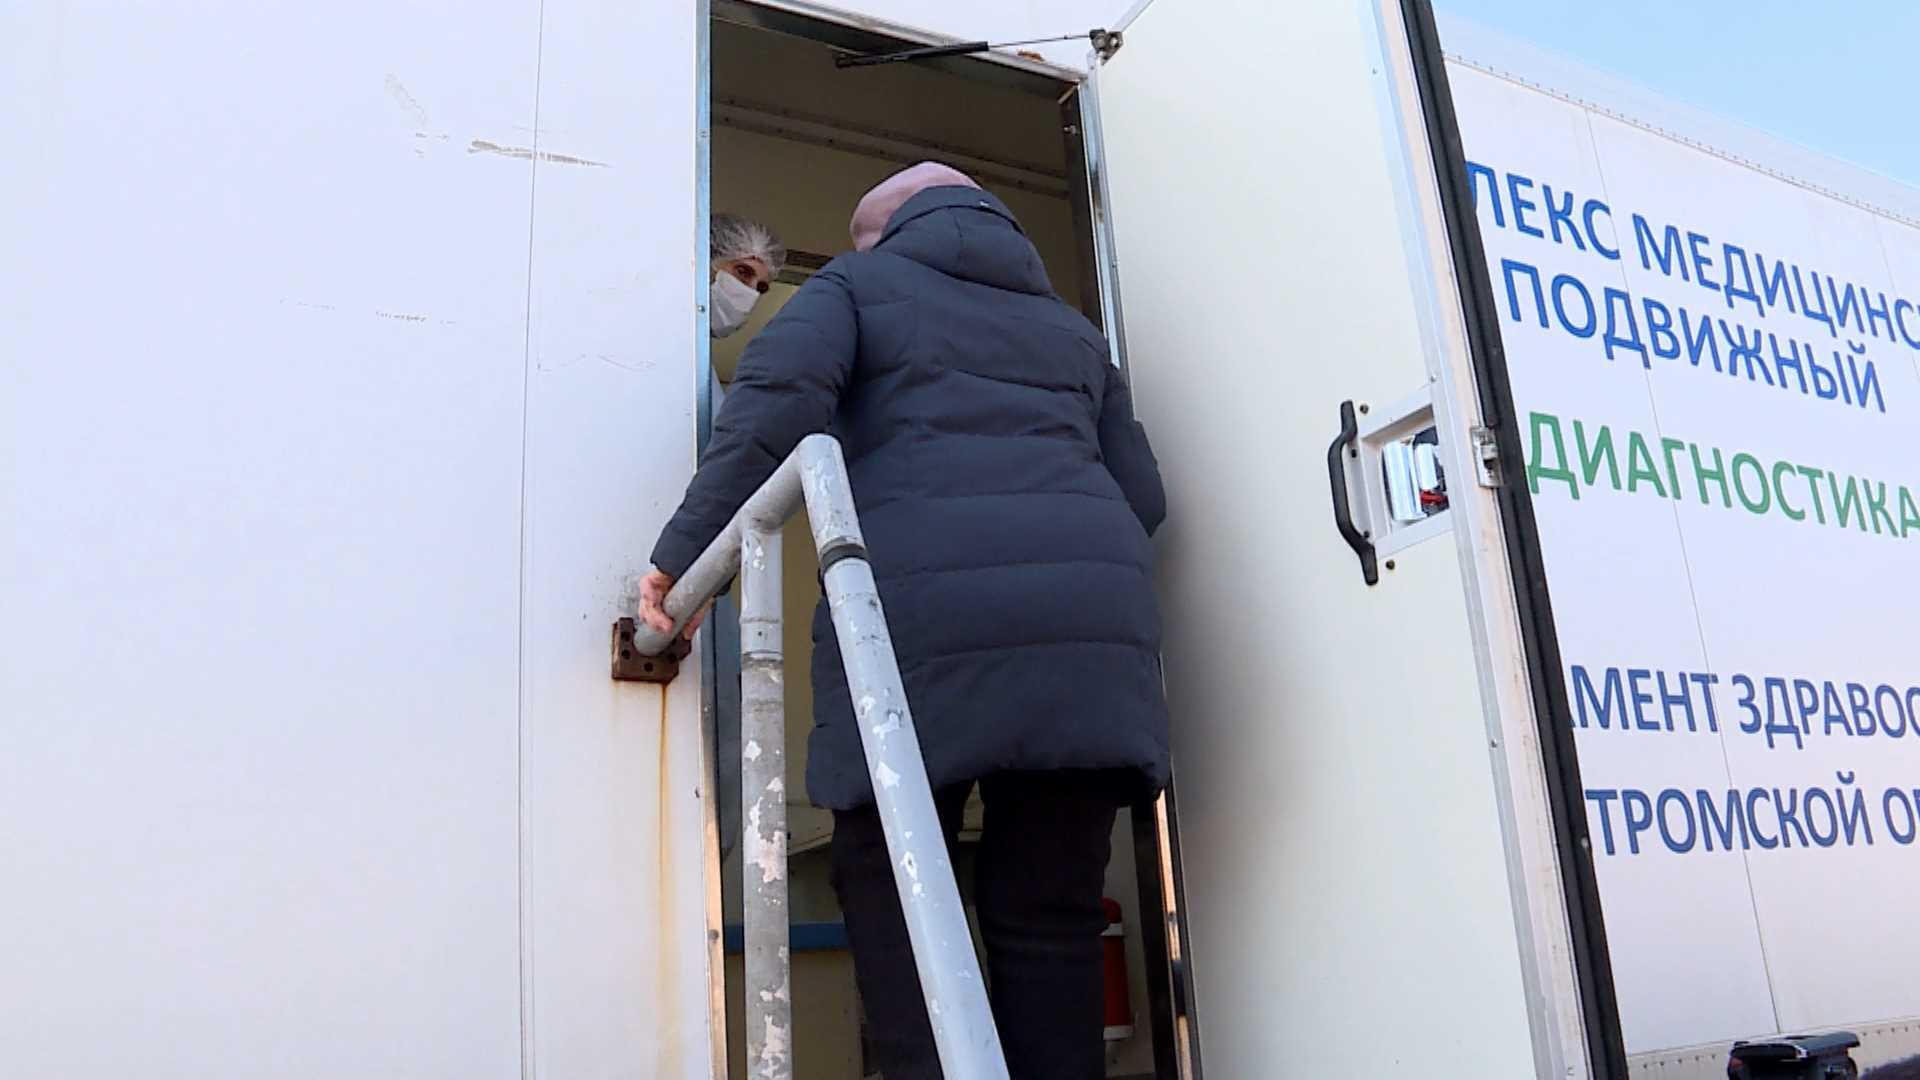 Гинеколог проведет осмотр пациенток на парковке костромского ТЦ